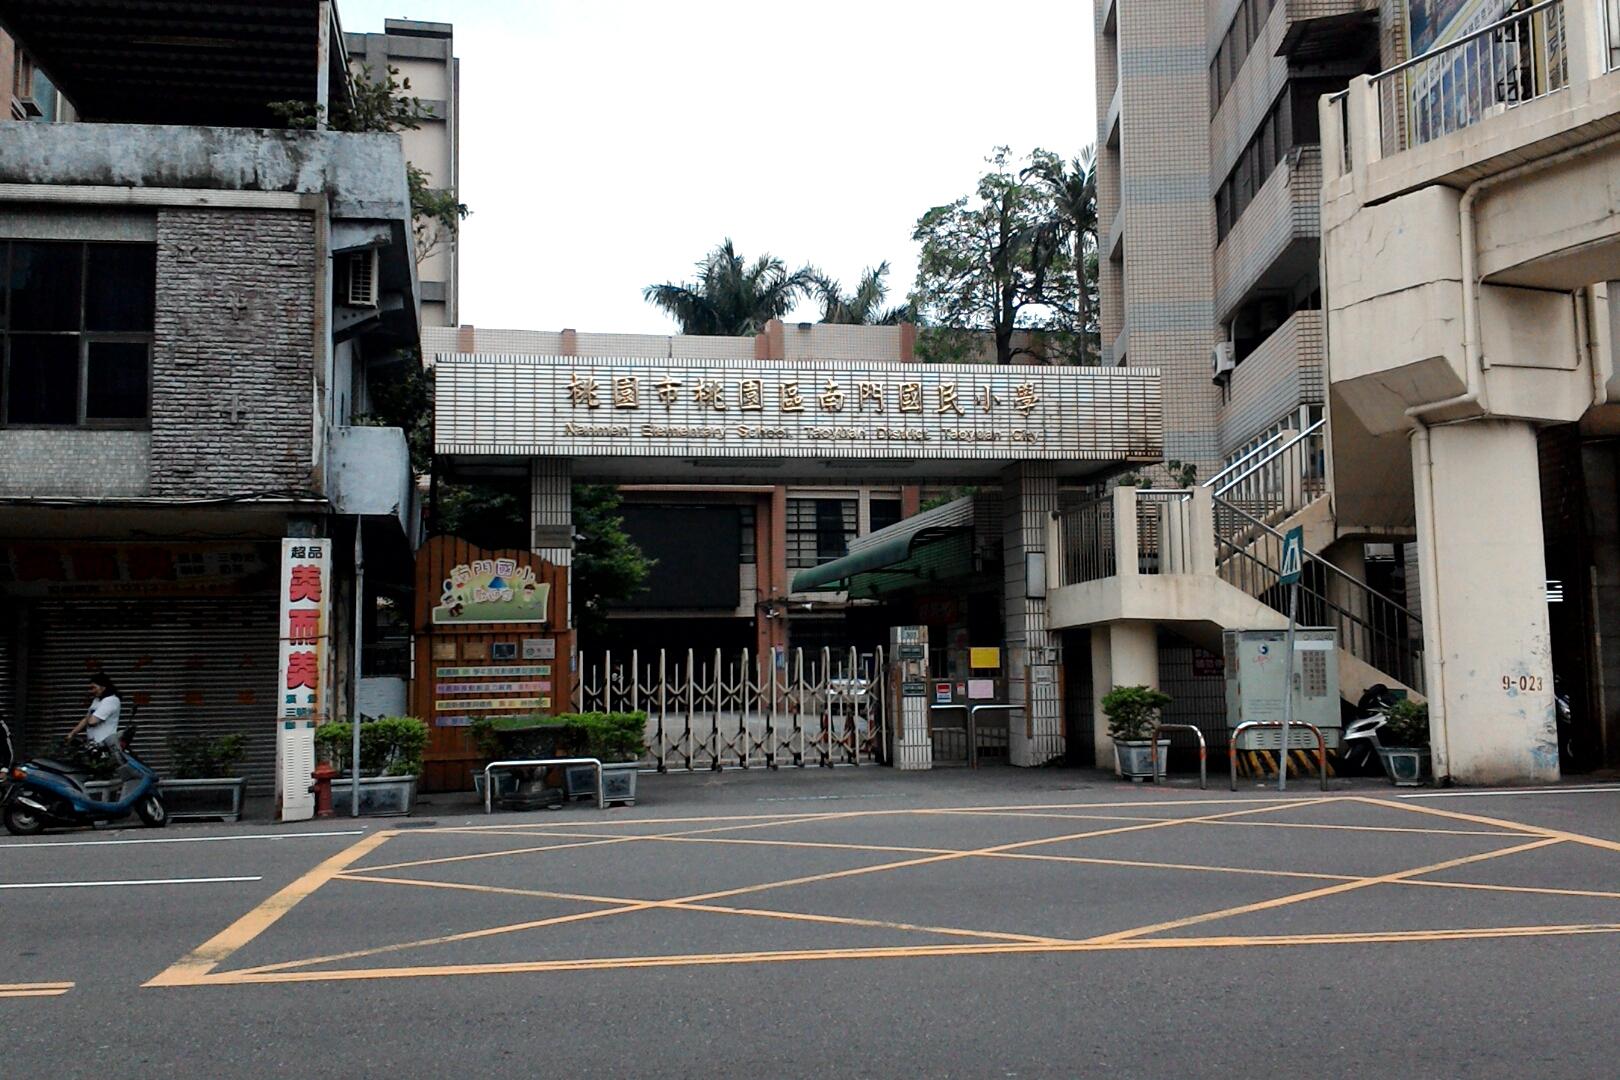 File:桃園市桃園區南門國民小學.jpg - Wikimedia Commons